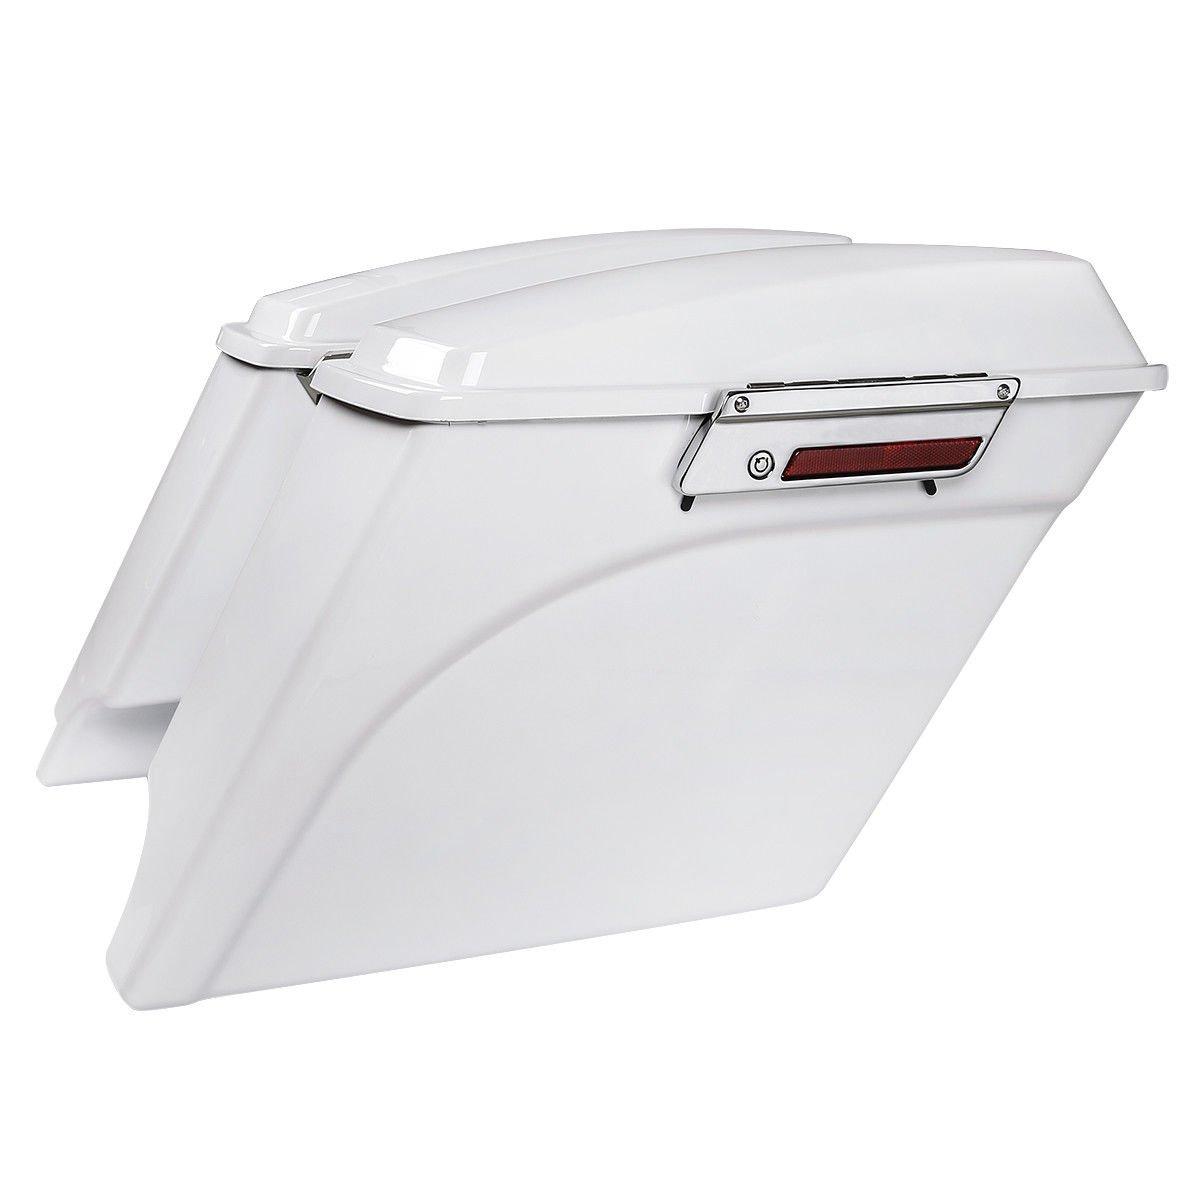 TCMT 5'' Extended Saddlebag Trunk W/Lids White Fits For Harley Touring Electra Glide 93-13